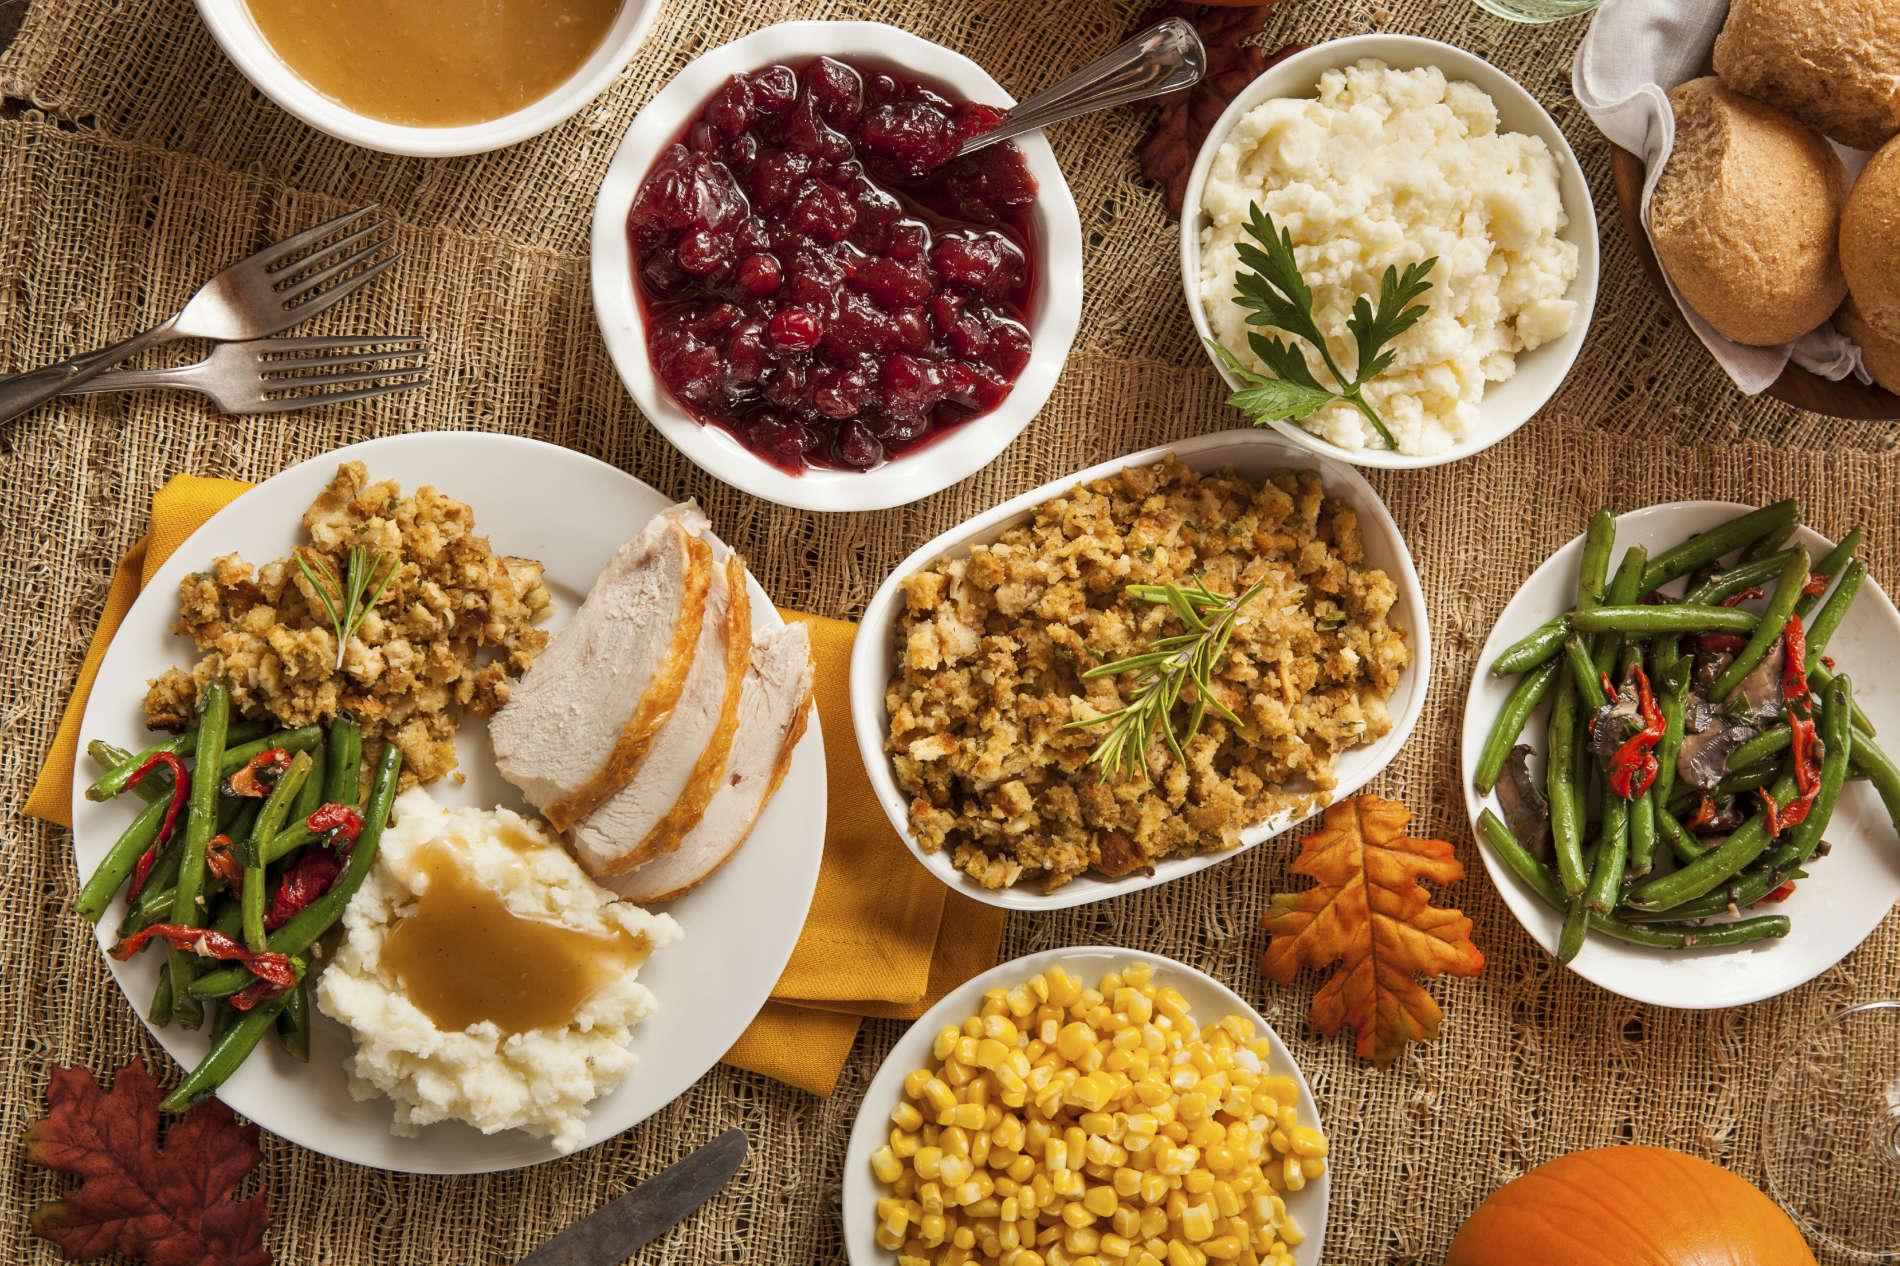 November 26th – Thanksgiving